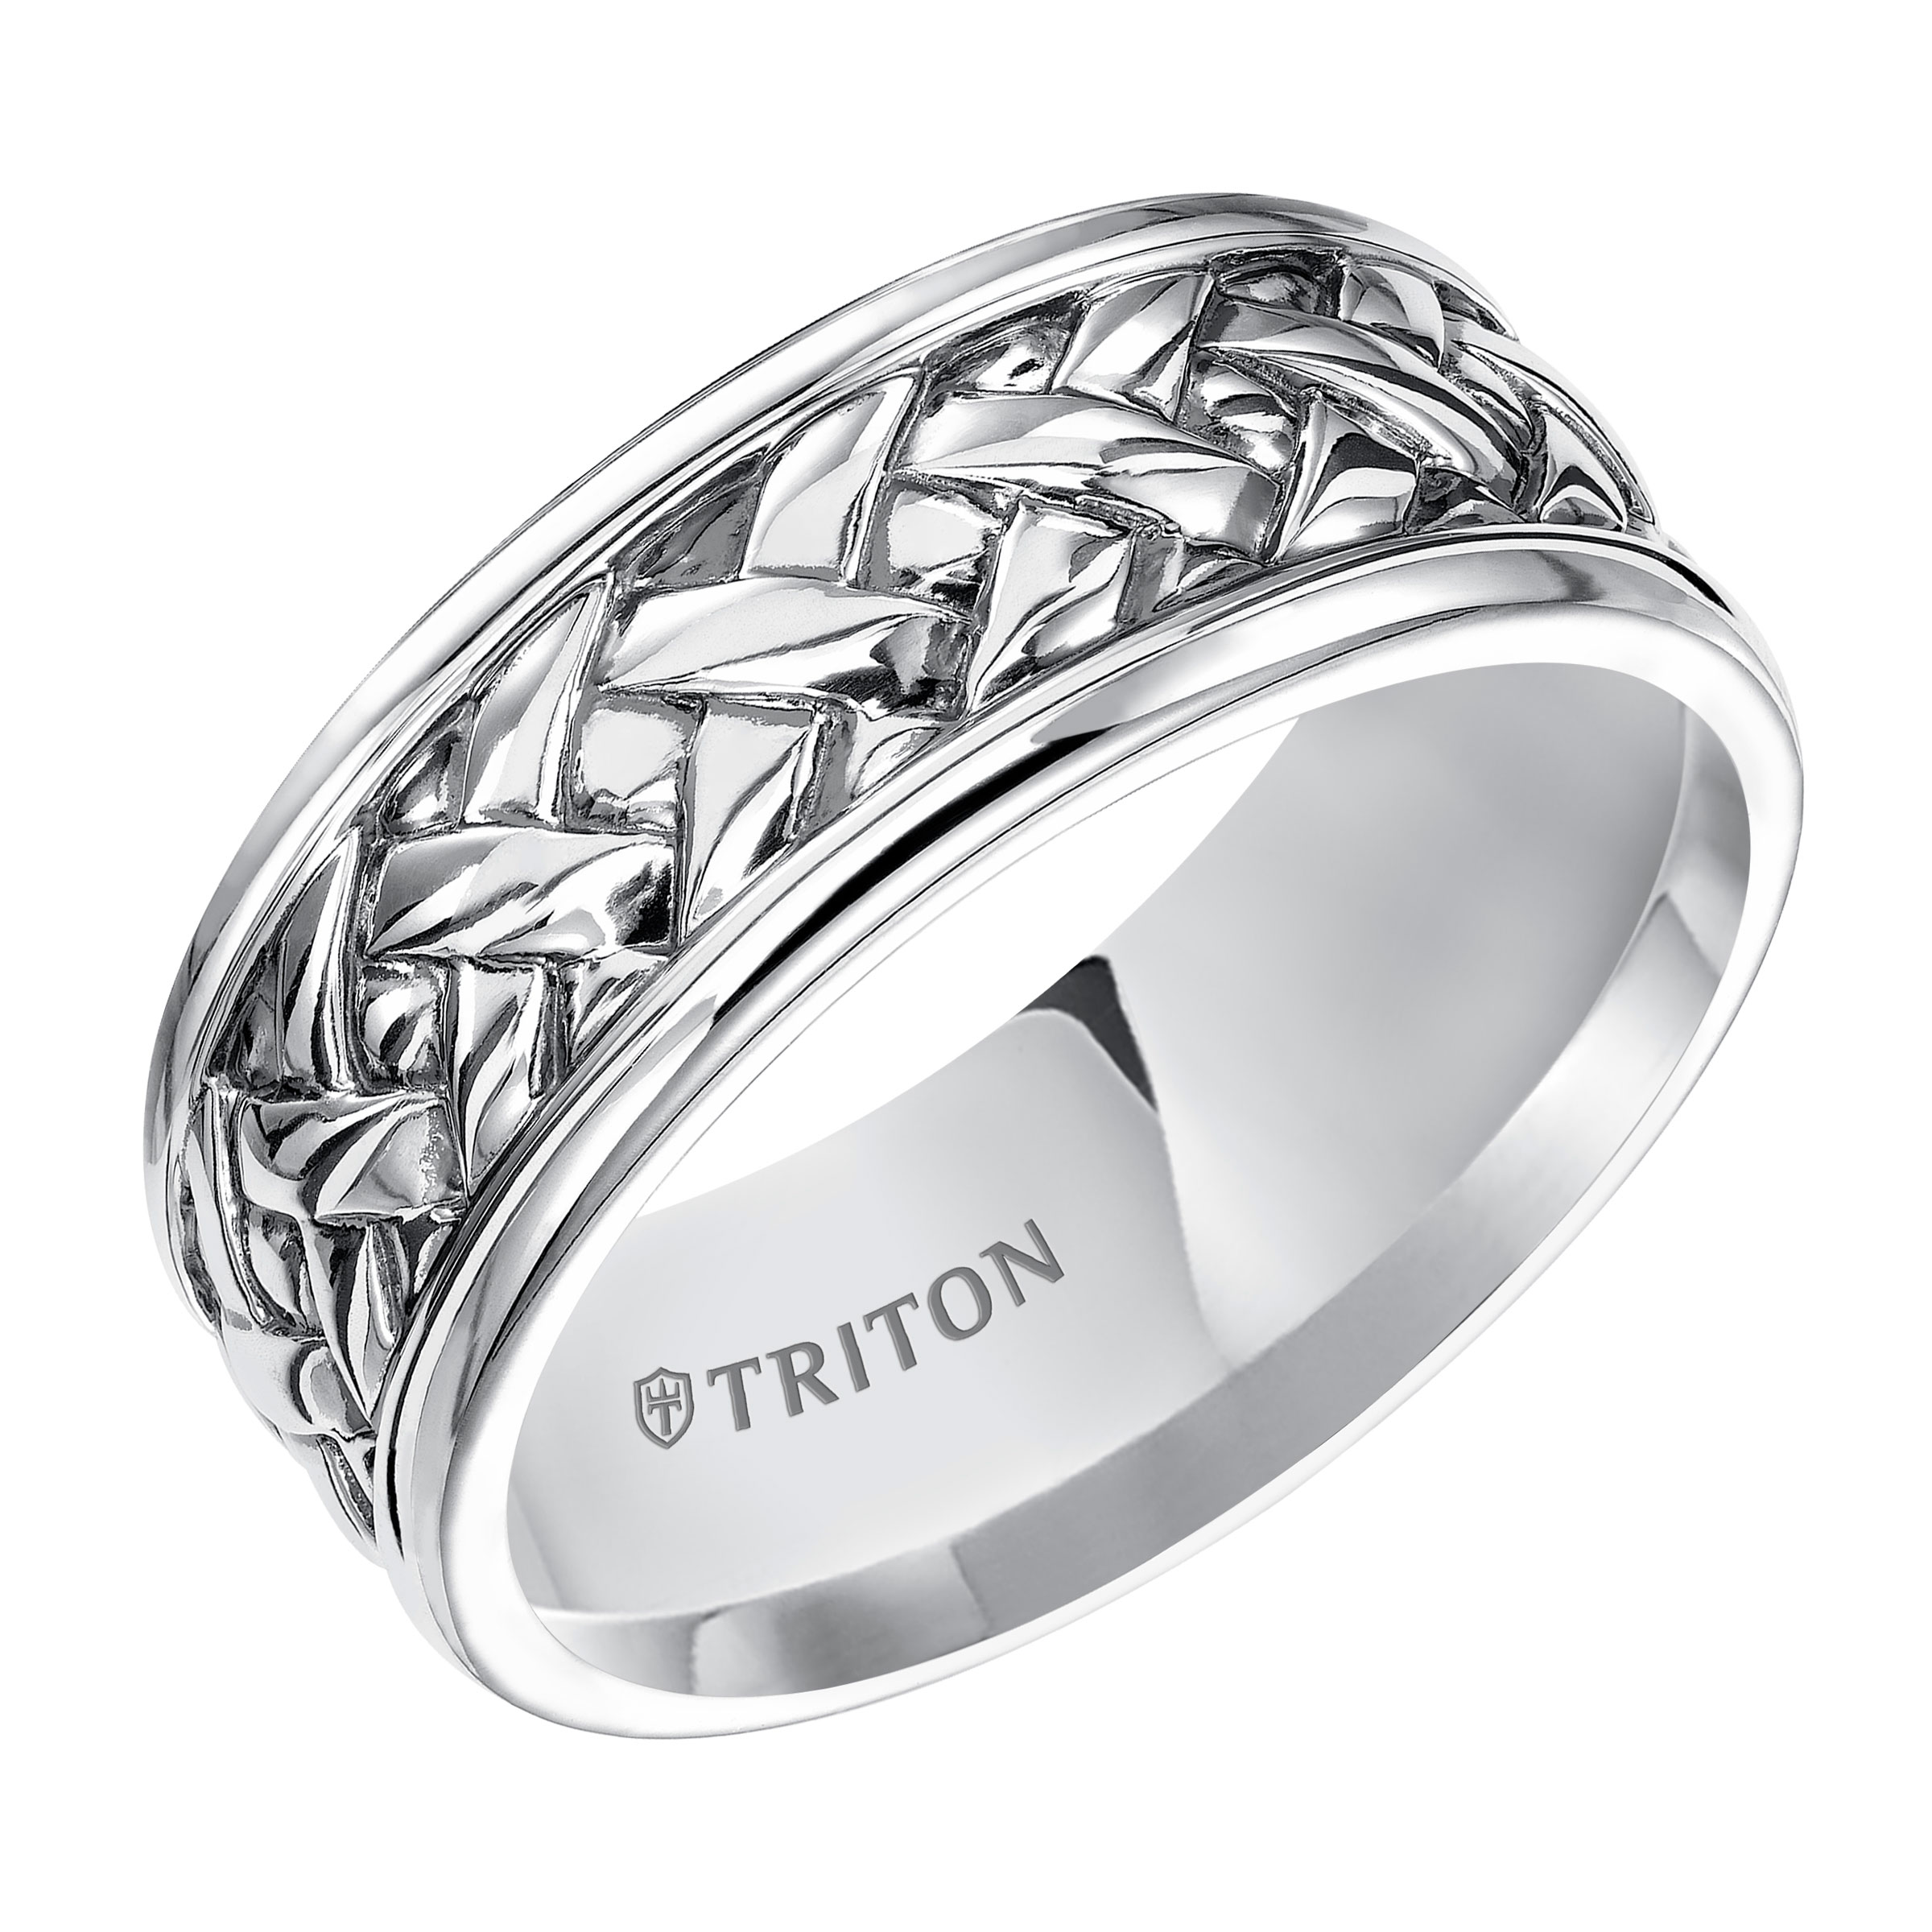 Triton 11 4935sv g0 long island ny triton mens for Long island wedding bands